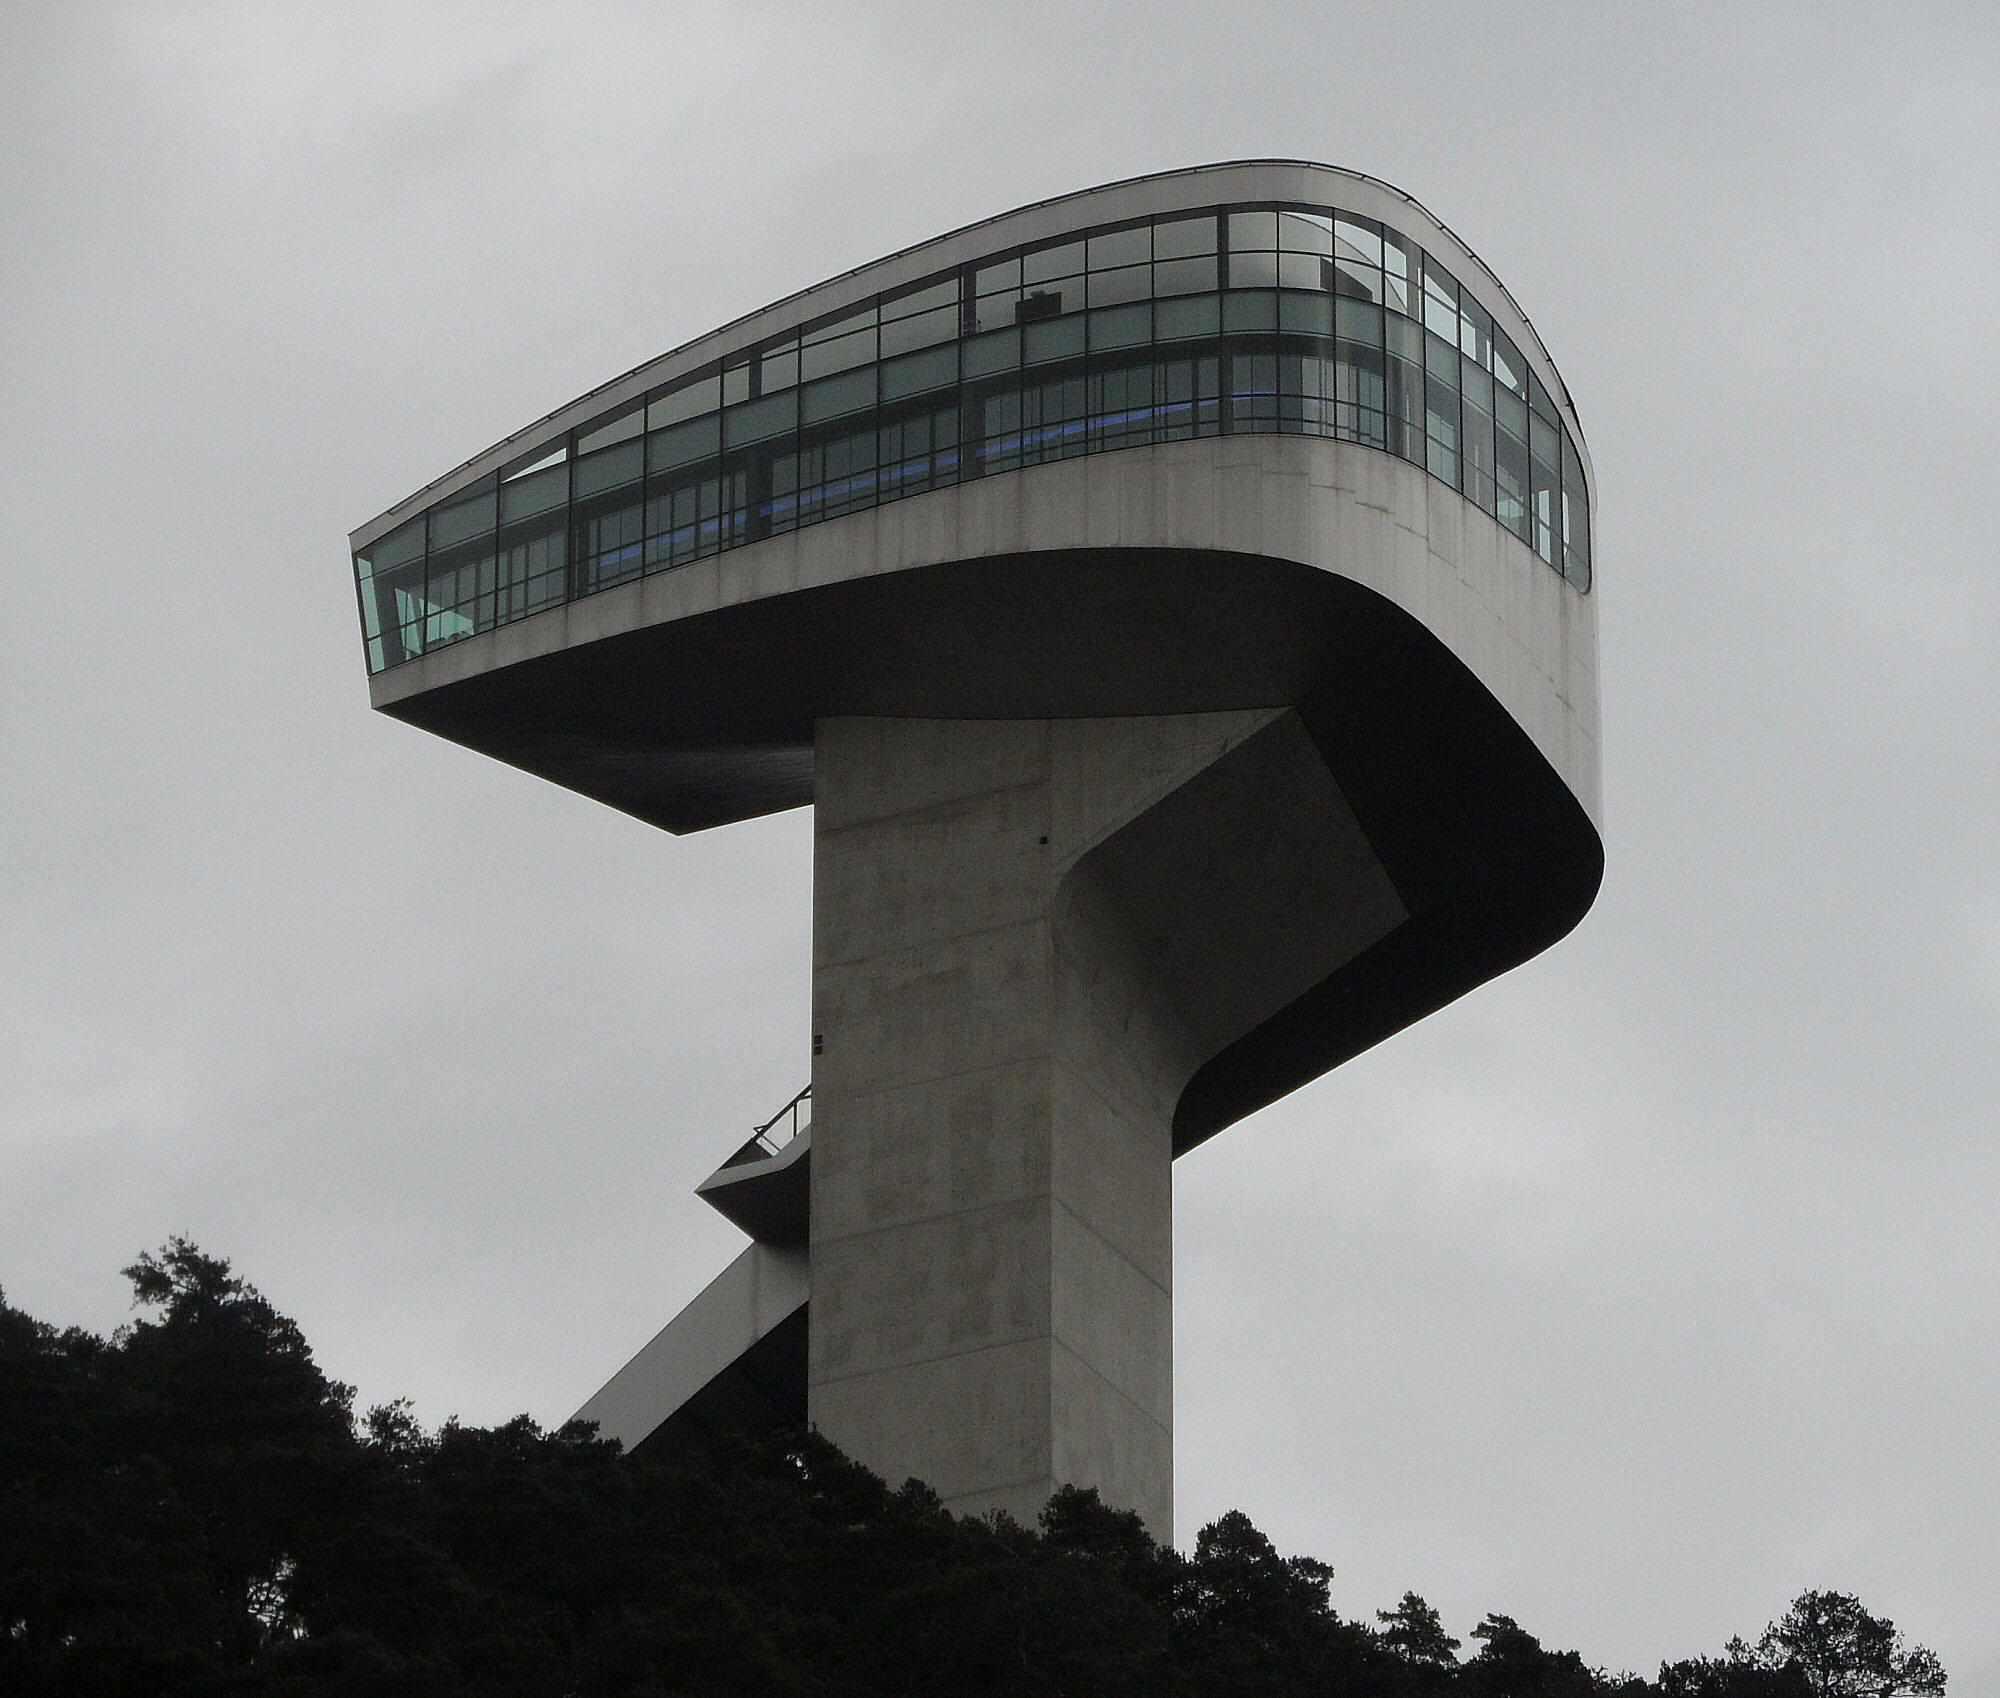 Innsbruck ski jump attached to glass-facade cafe atop a concrete pedestal.